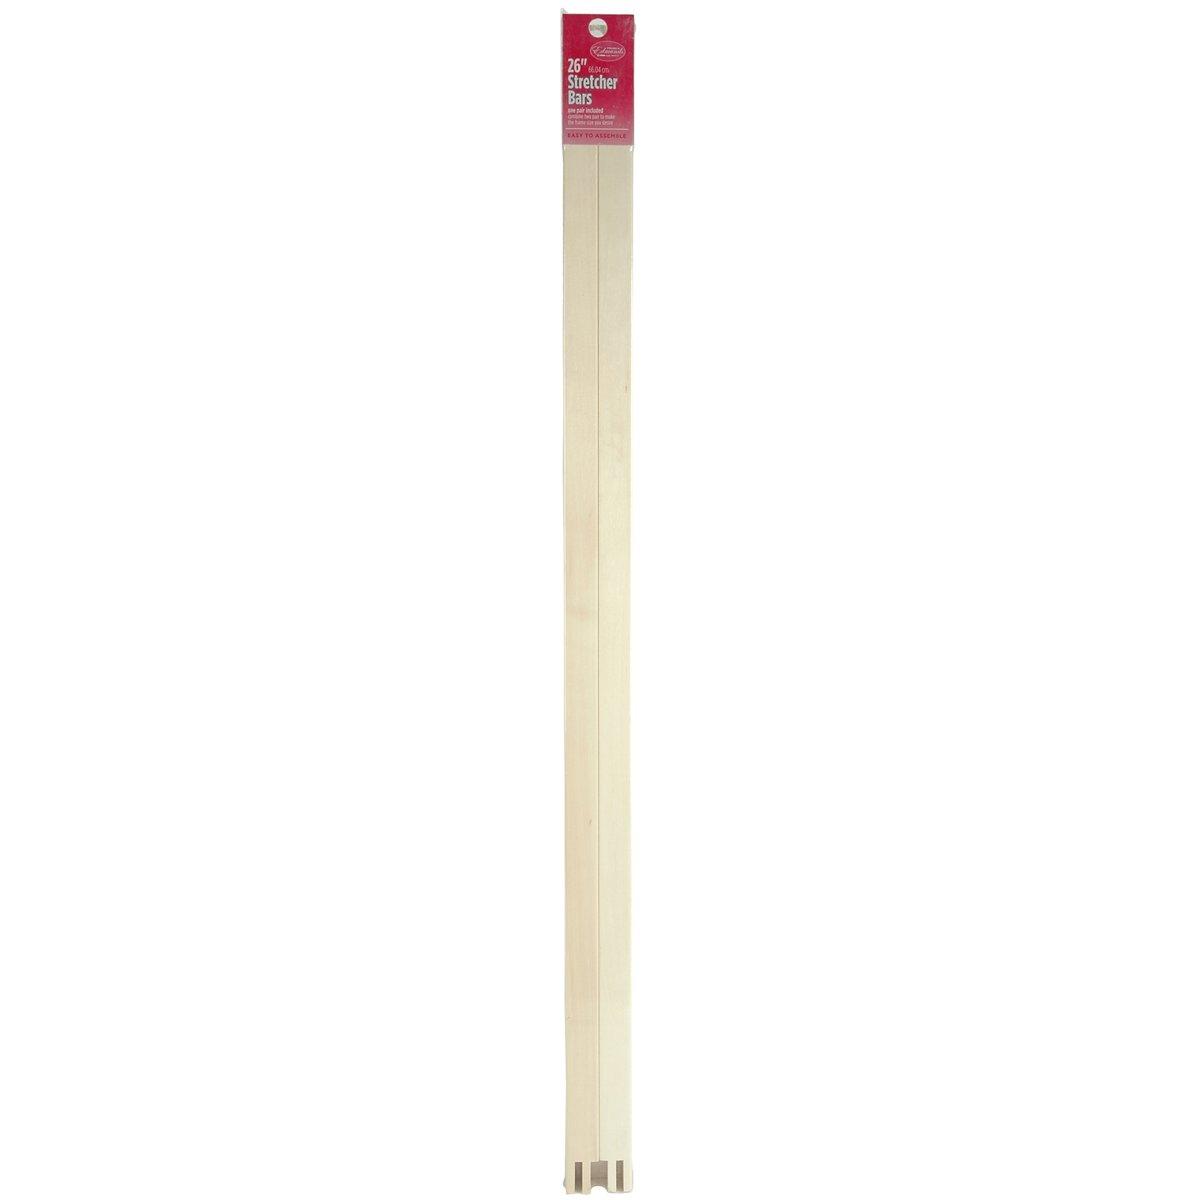 16 by 3//4-Inch Edmunds 3016 Regular Stretcher Bars for Needle Art